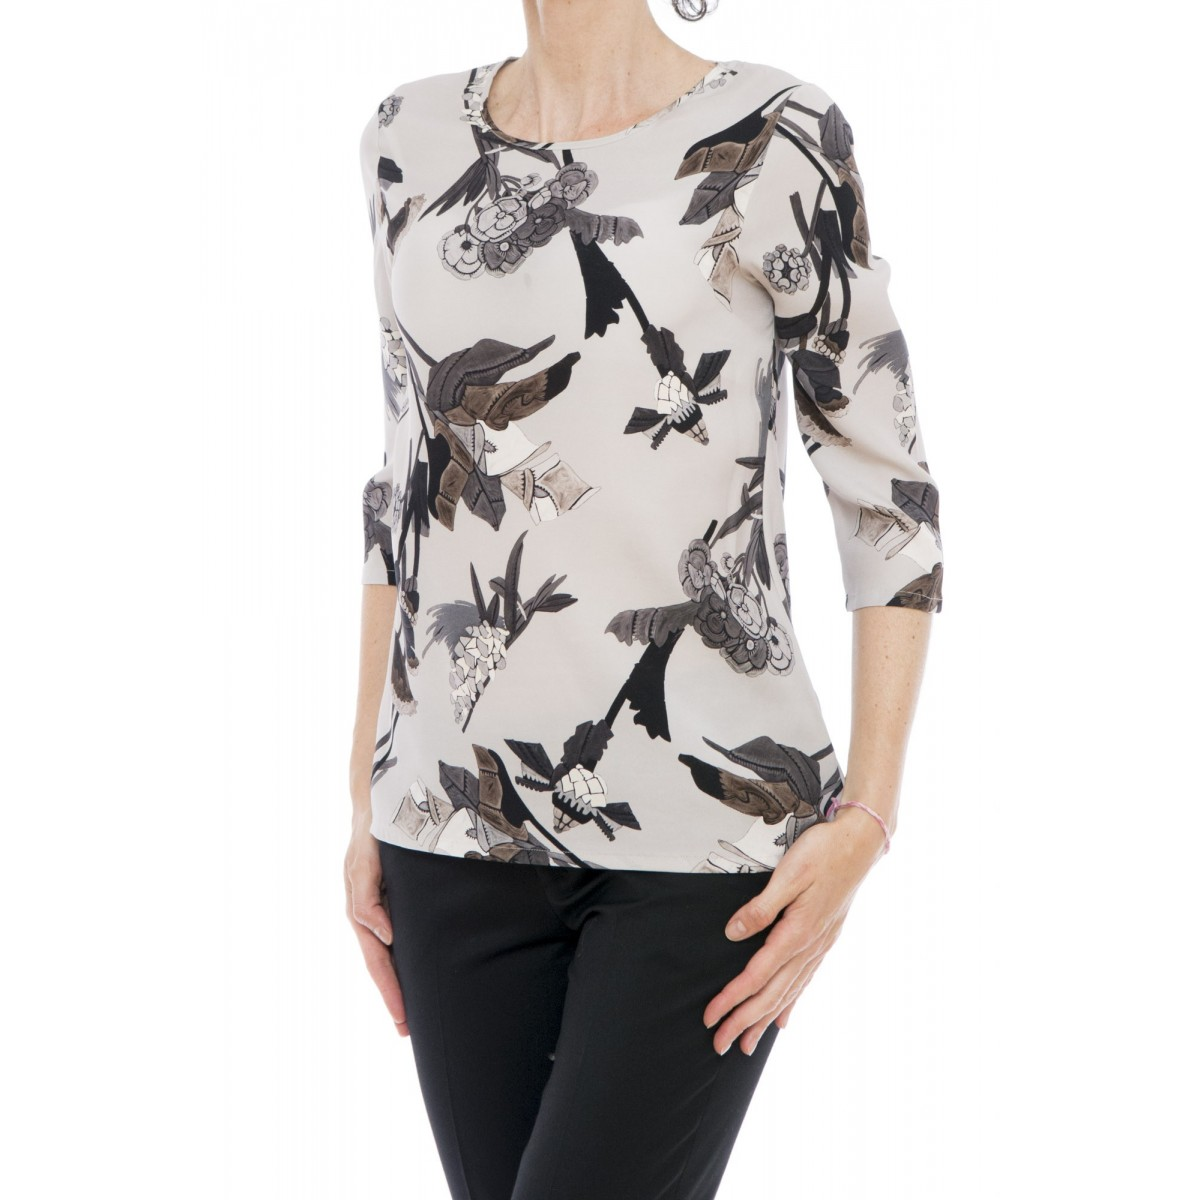 Camicia donna Kangra - 2565/90 camicia seta stampata